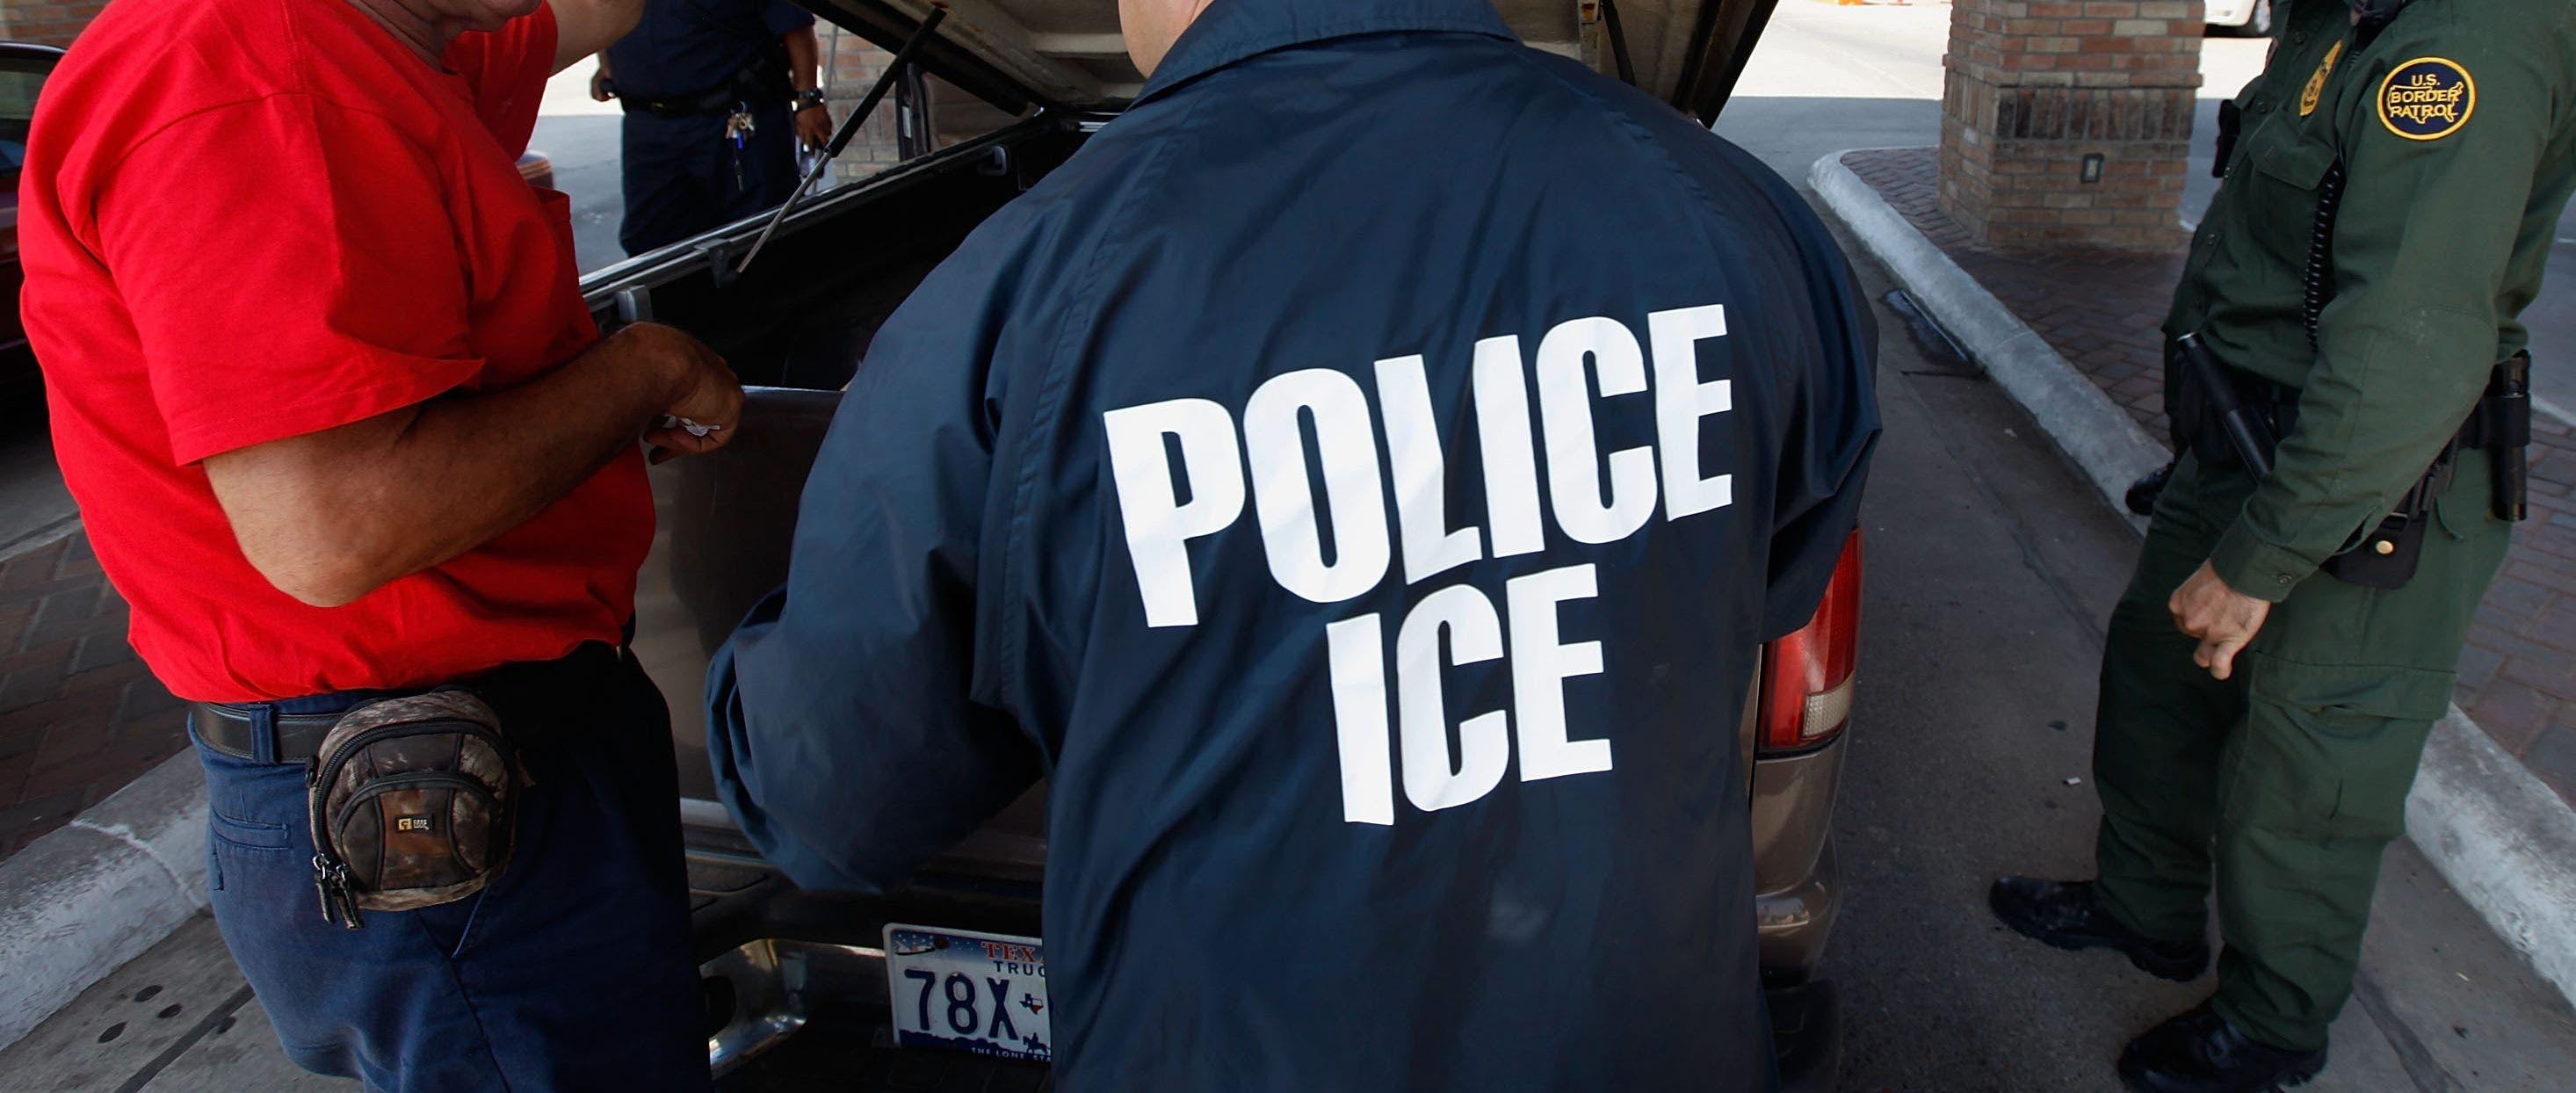 Westlake Legal Group e7262e59-ICE-BT ICE announces hundreds of migrants arrested in raid operations Ronn Blitzer John Roberts fox-news/us/immigration fox news fnc/politics fnc article 90072b7a-9468-5e50-a7c6-8a9e585485c7